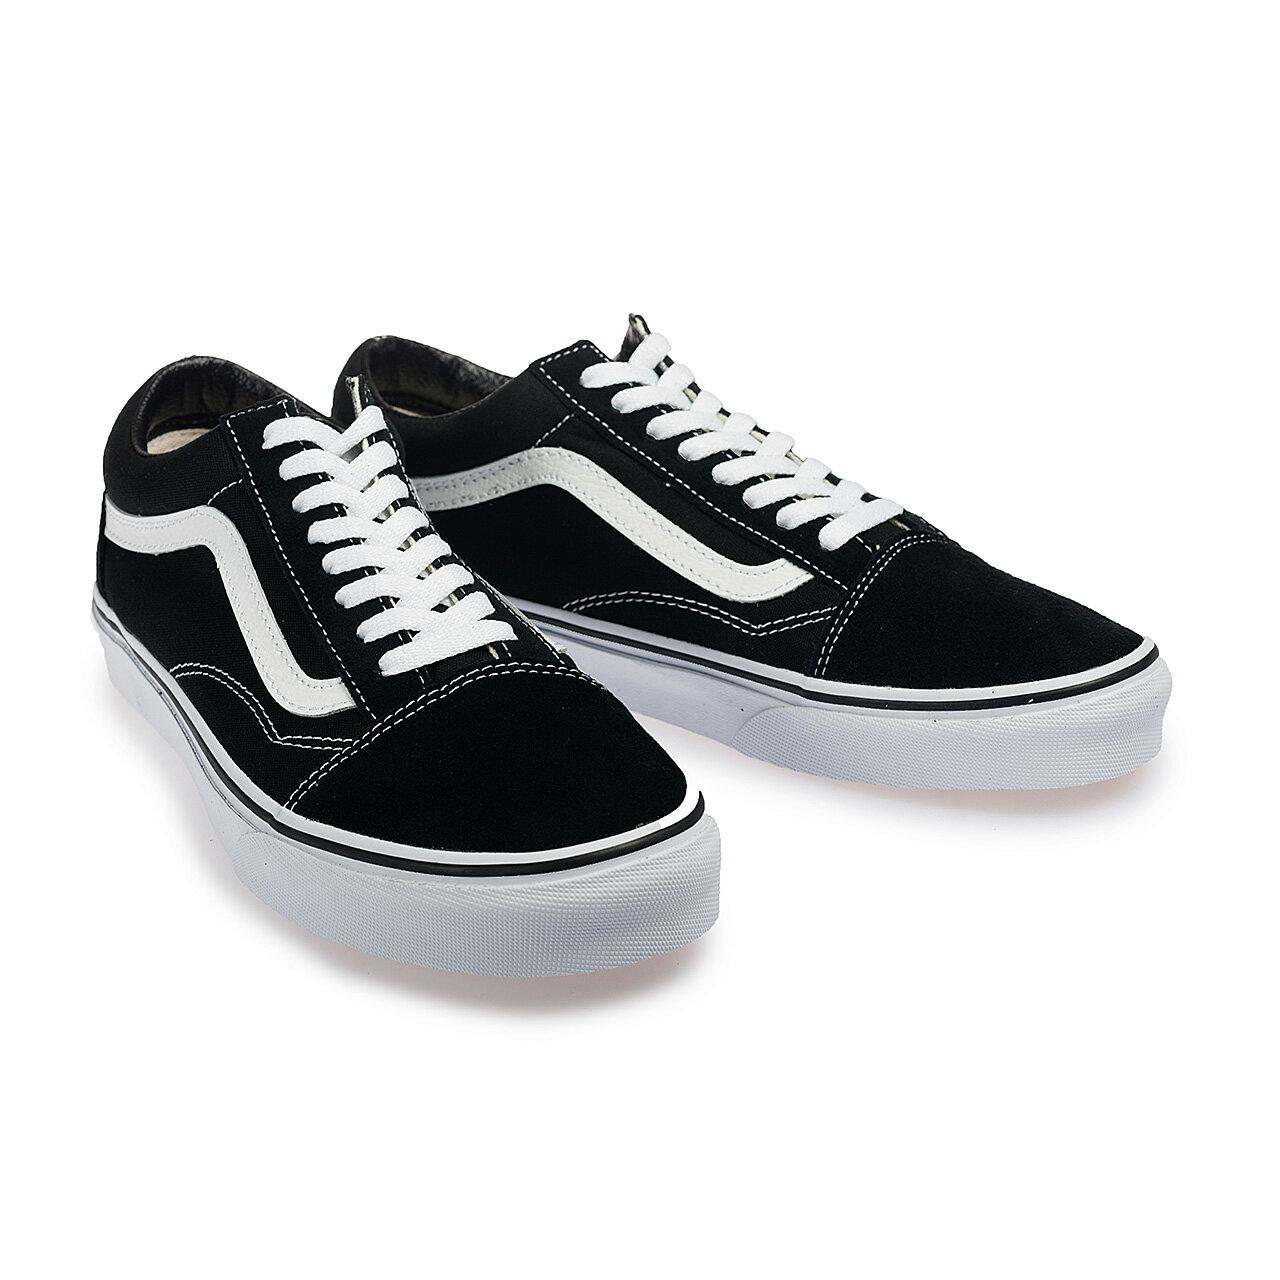 【VANS】Old Skool 基本款  黑 經典款 休閒鞋 男女 專櫃價2380  VN000D3HY28(palace store) 1